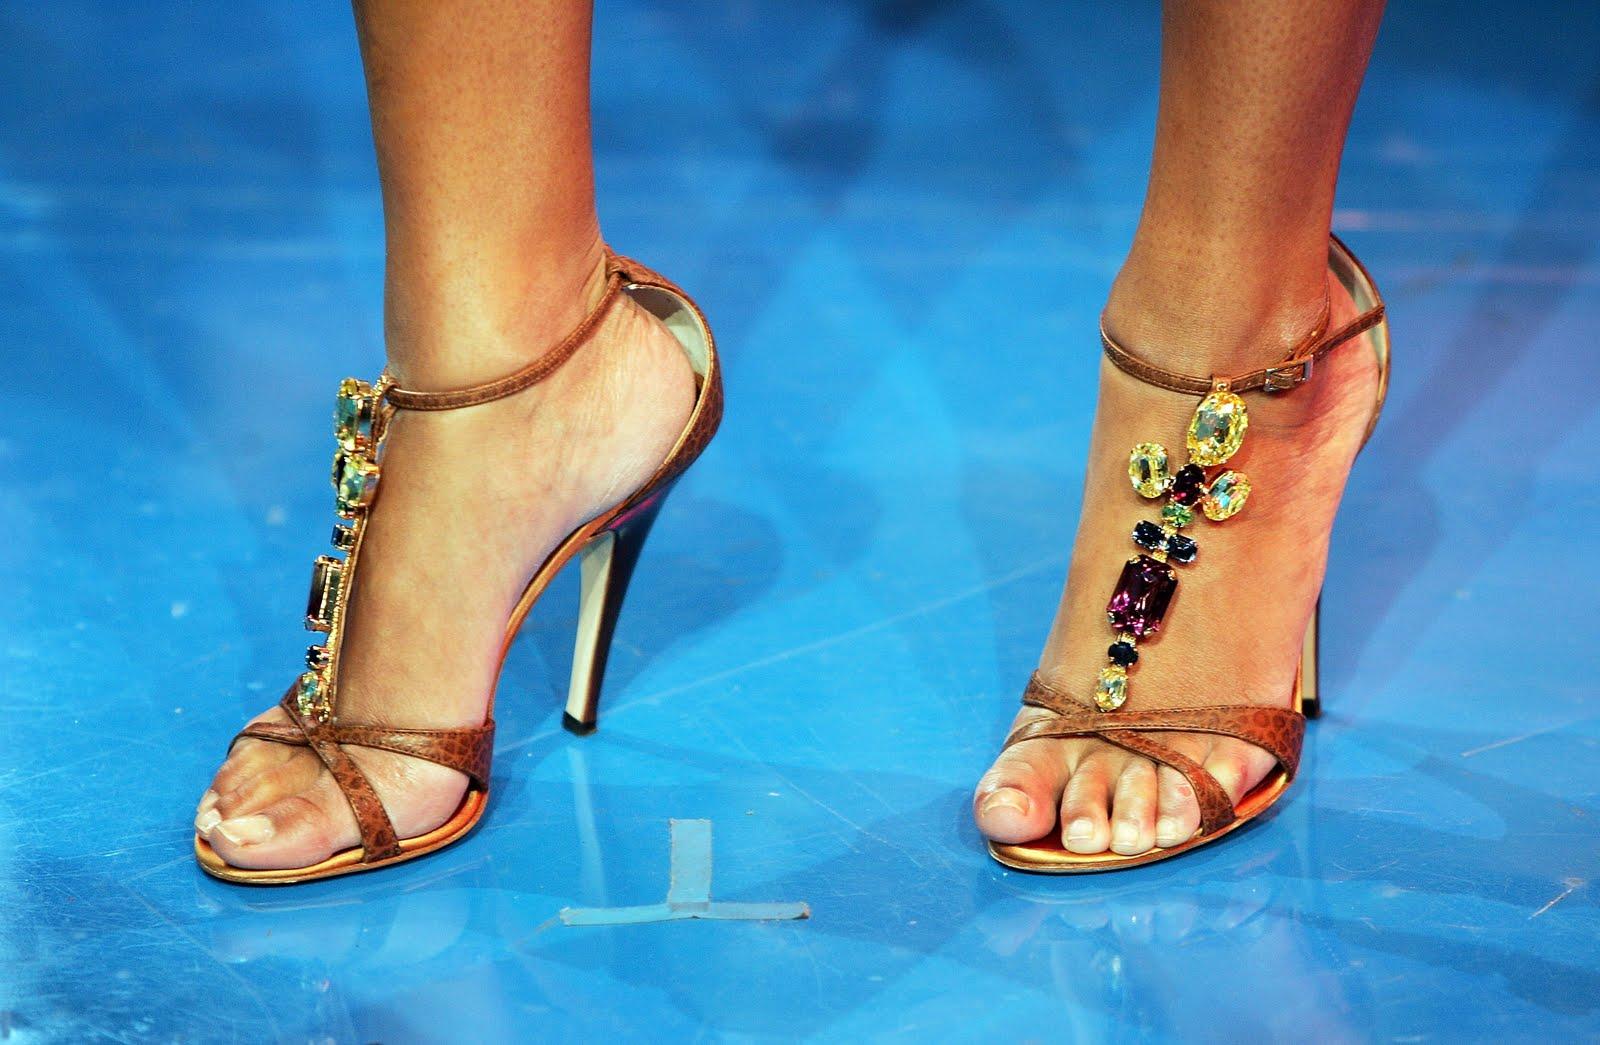 http://2.bp.blogspot.com/_lKe2XK1kSnY/S990DYQfAsI/AAAAAAAABuA/Ms6qnv8hGIo/s1600/beyonce-knowles-feet.jpg